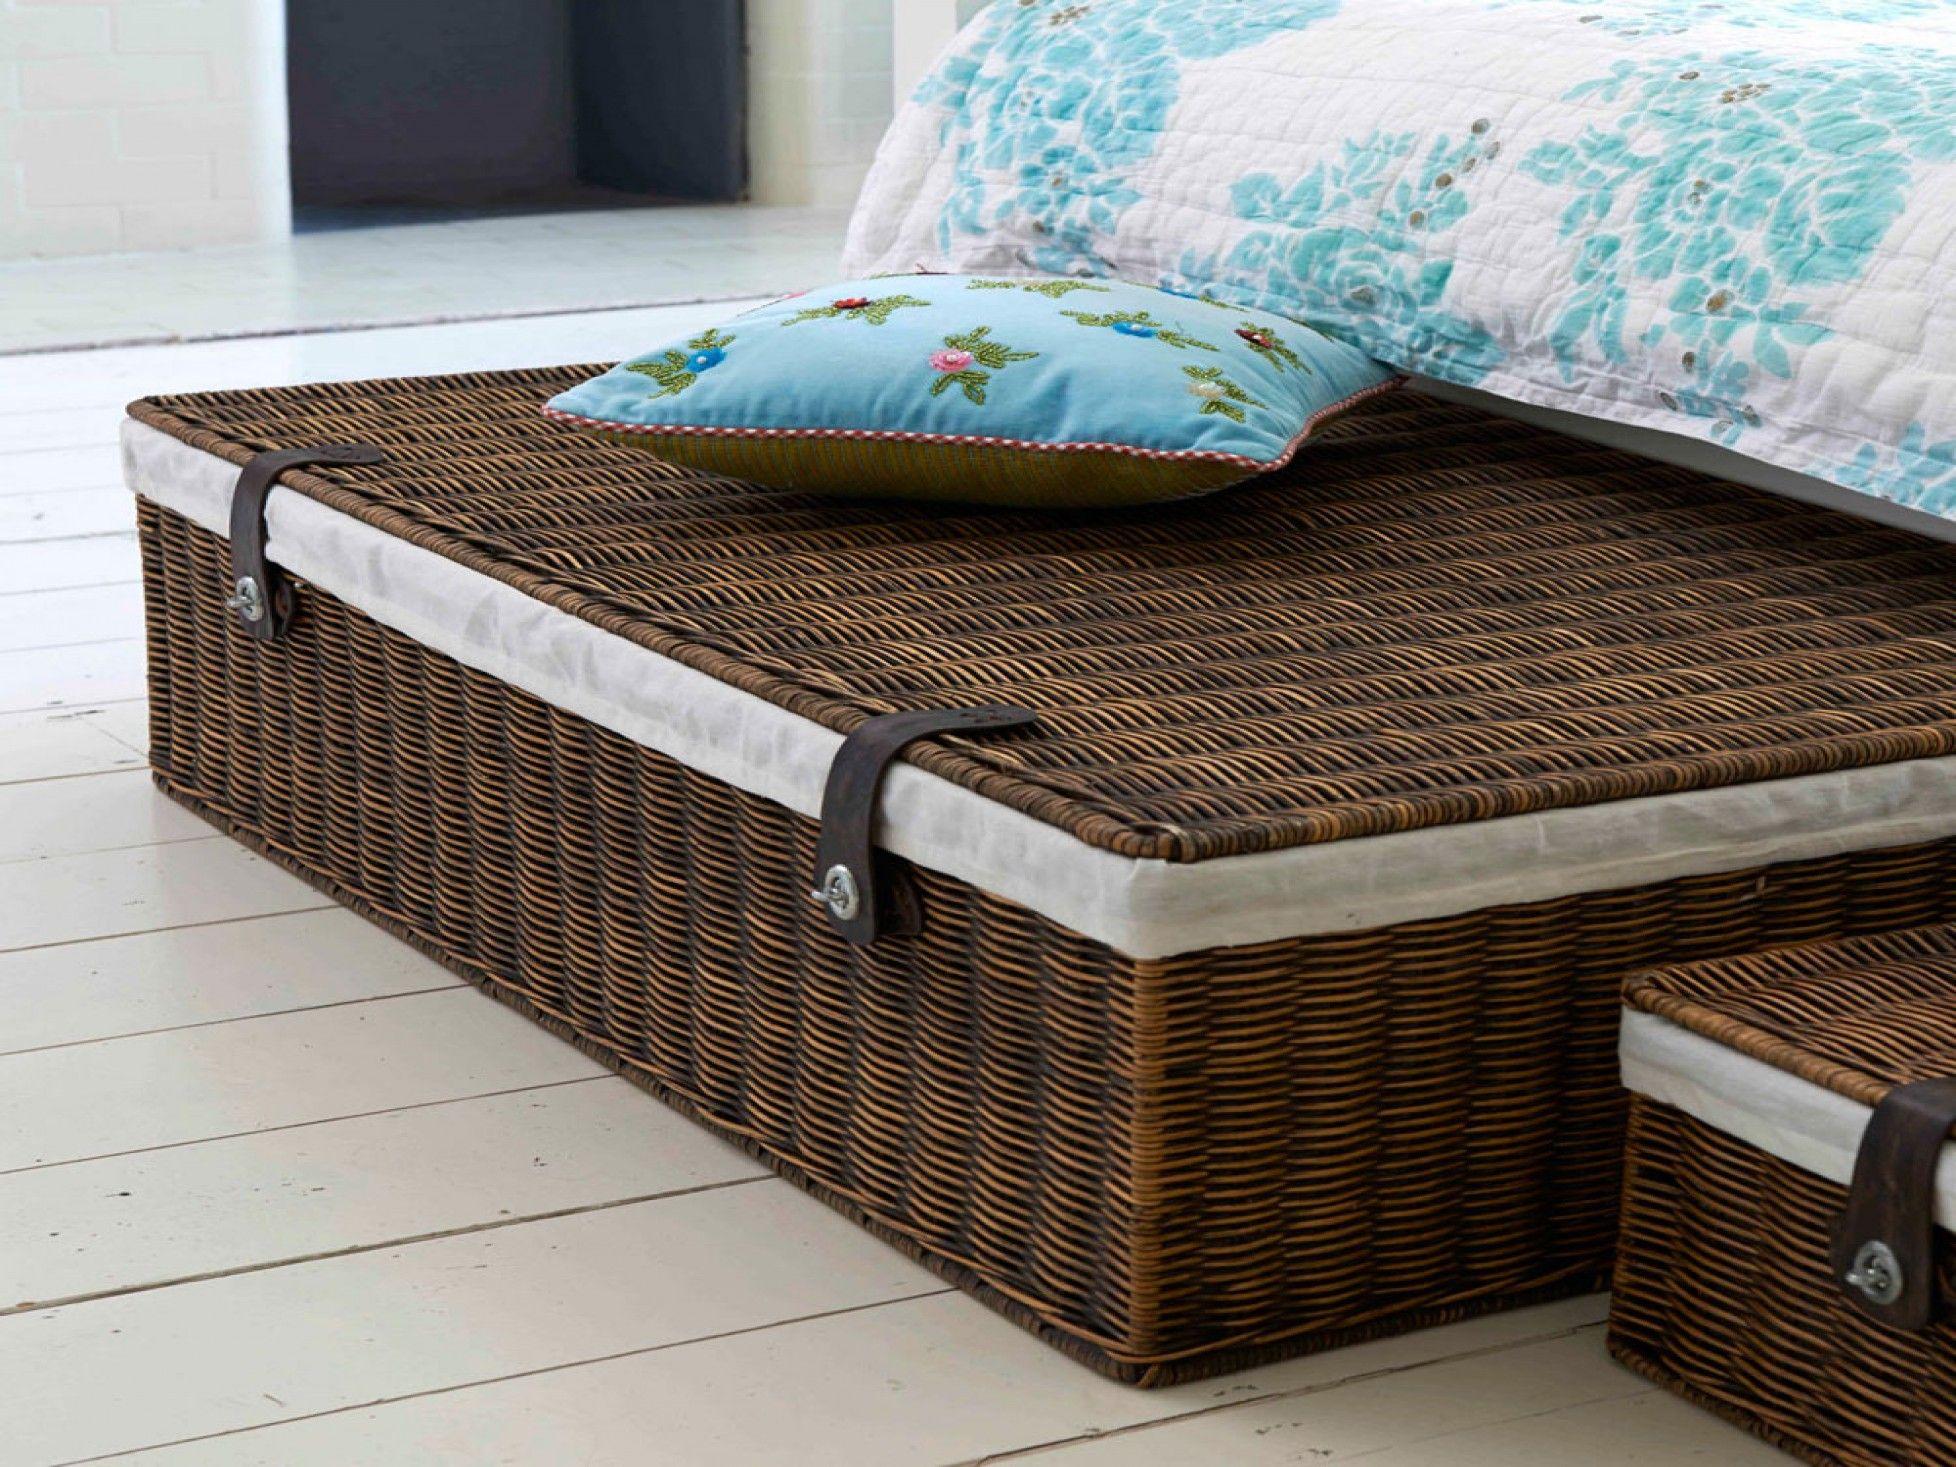 Marlow Underbed Storage Lined Rattan Basket Under bed